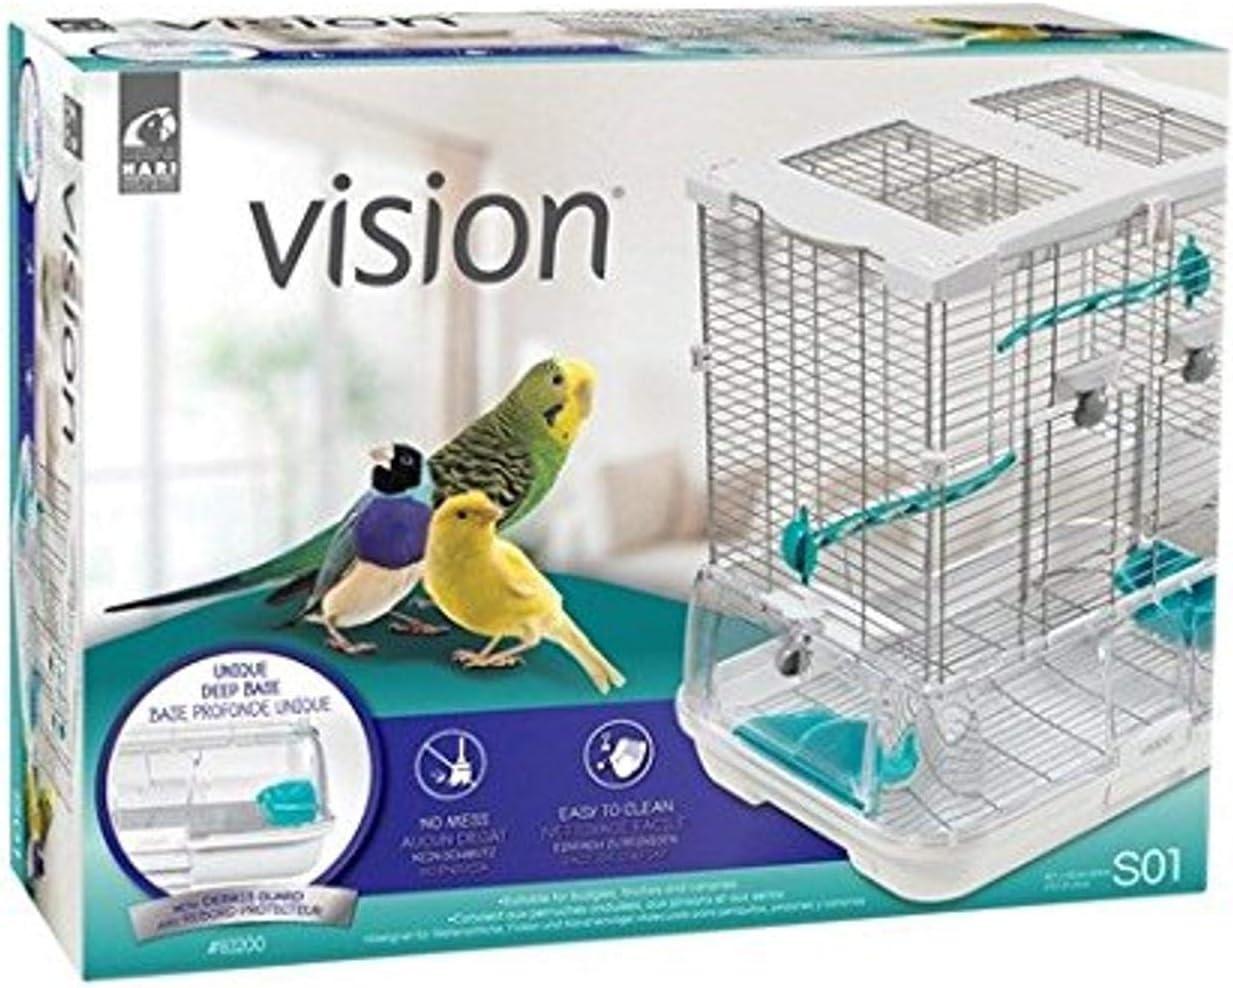 VisionJaula ModeloS01,45,5 x 35,5 x 51cm